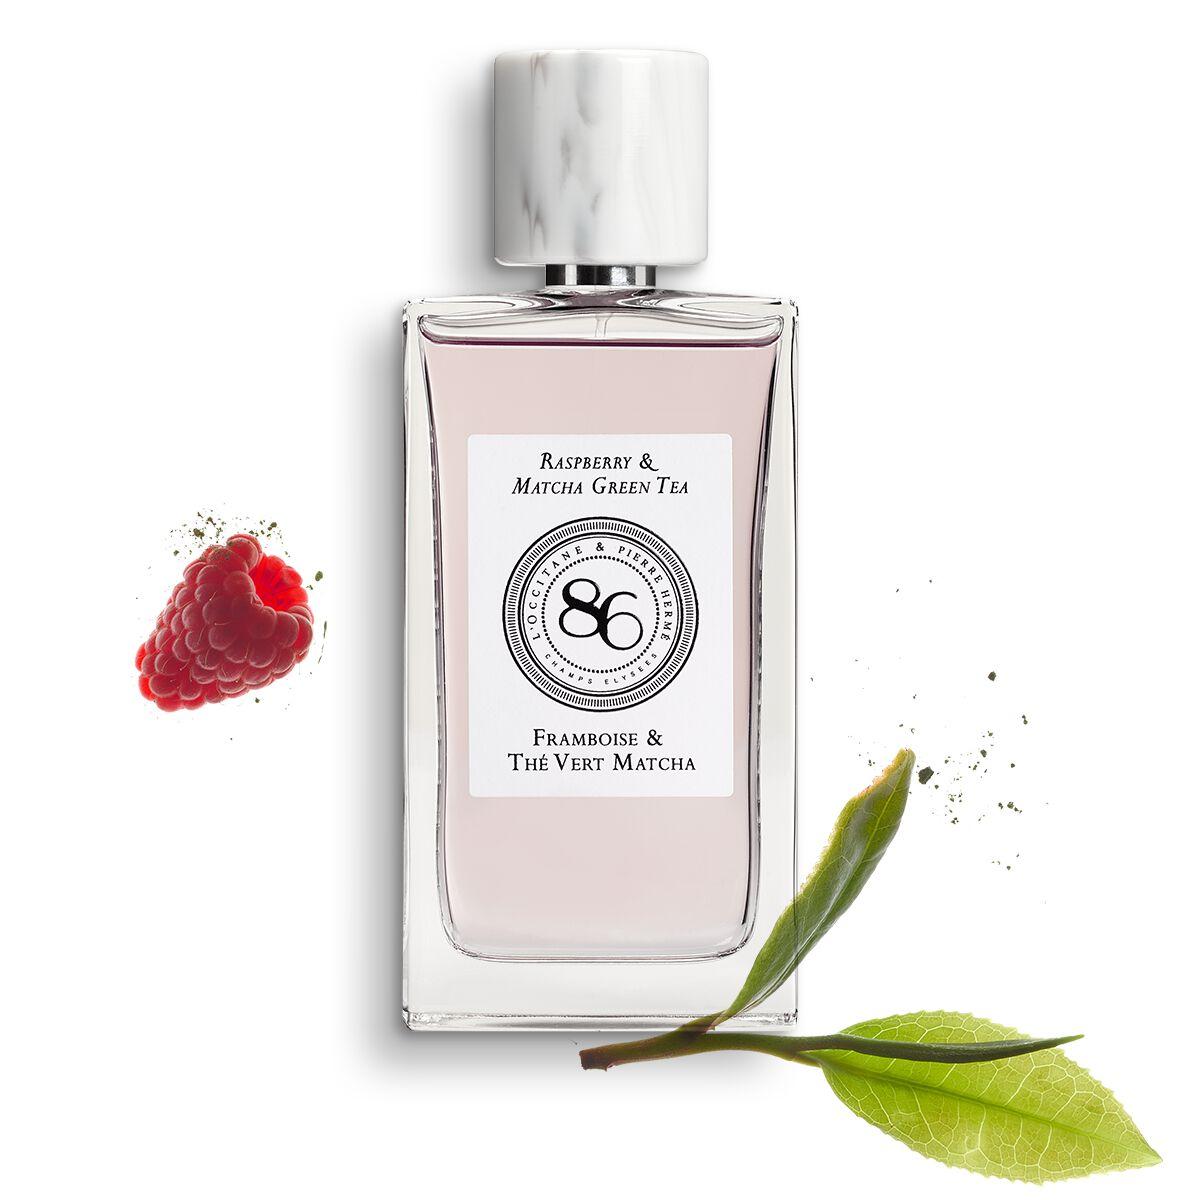 Raspberry & Matcha Green Tea Eau de Parfum 3.04 fl. oz.